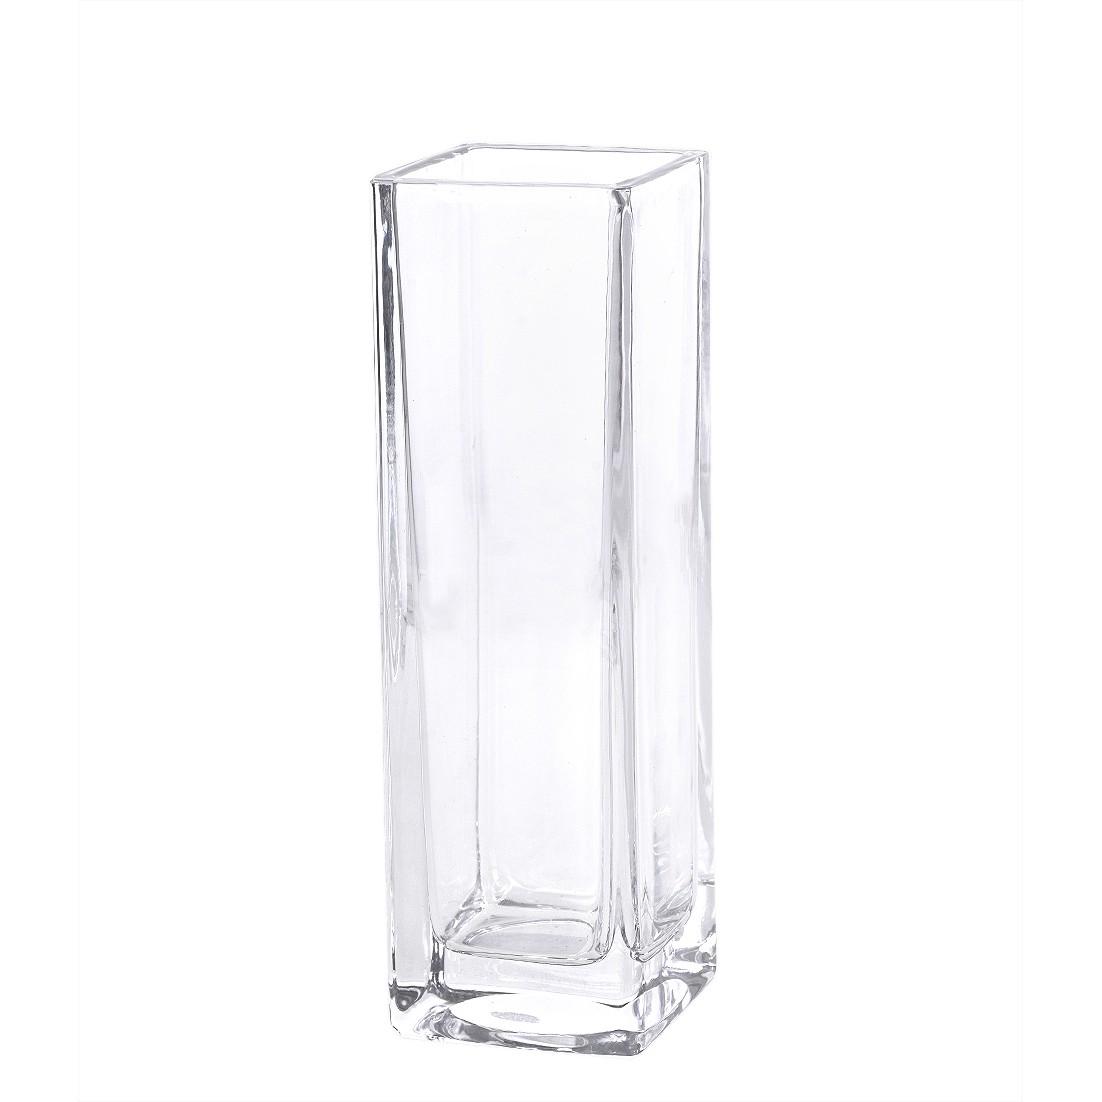 Vaso Decorativo de Vidro Transparente 17 cm